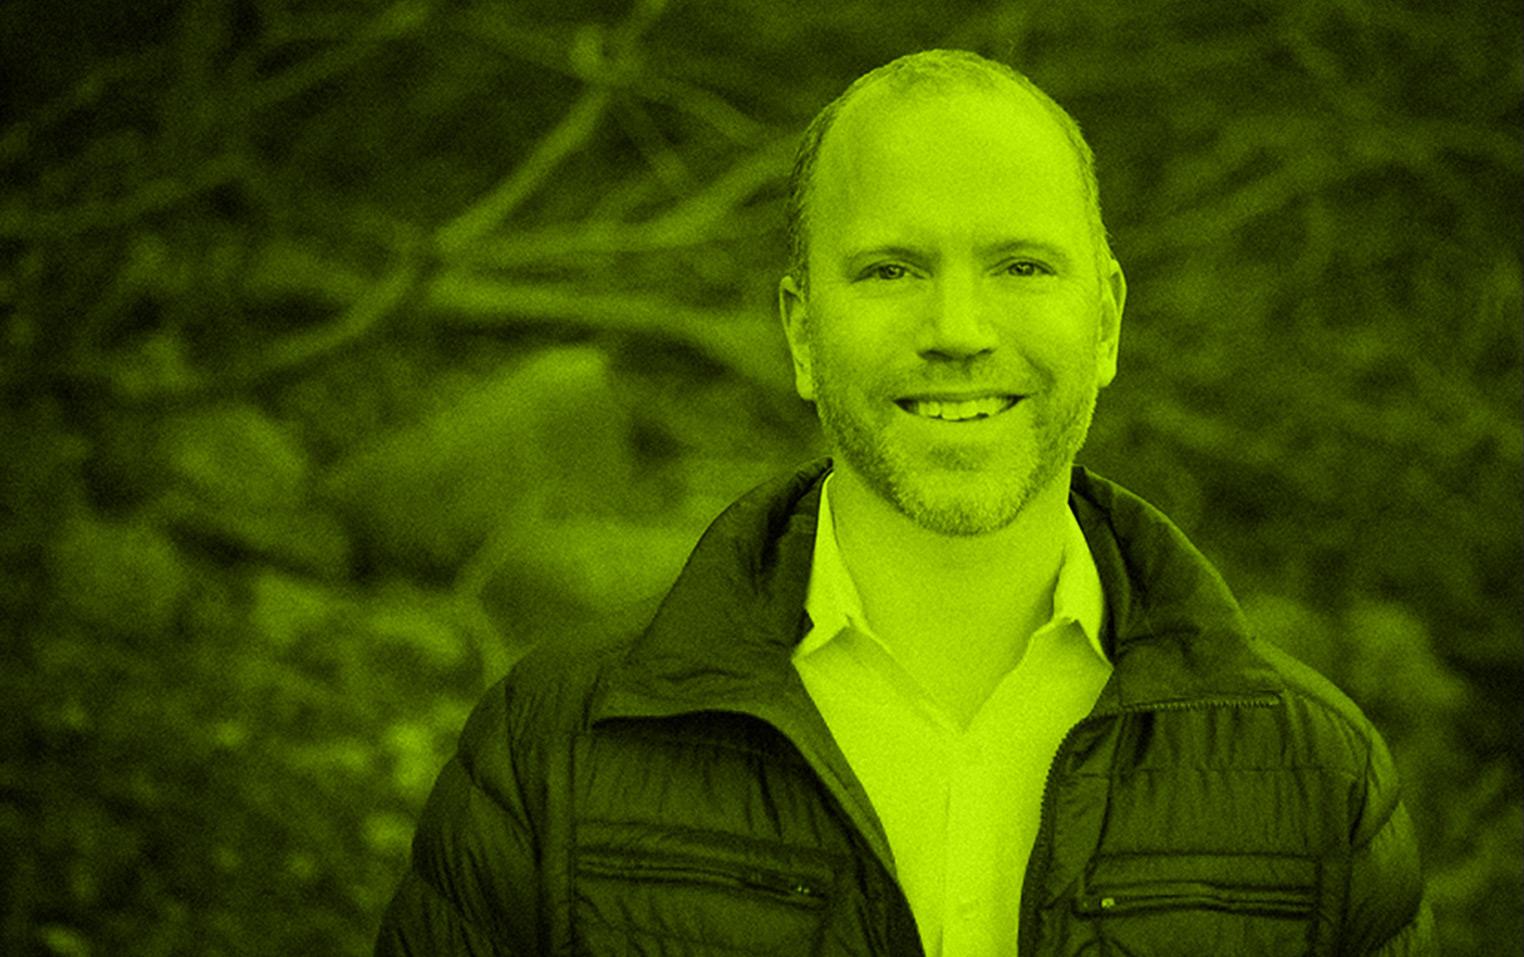 Beatport CEO Robb McDaniels